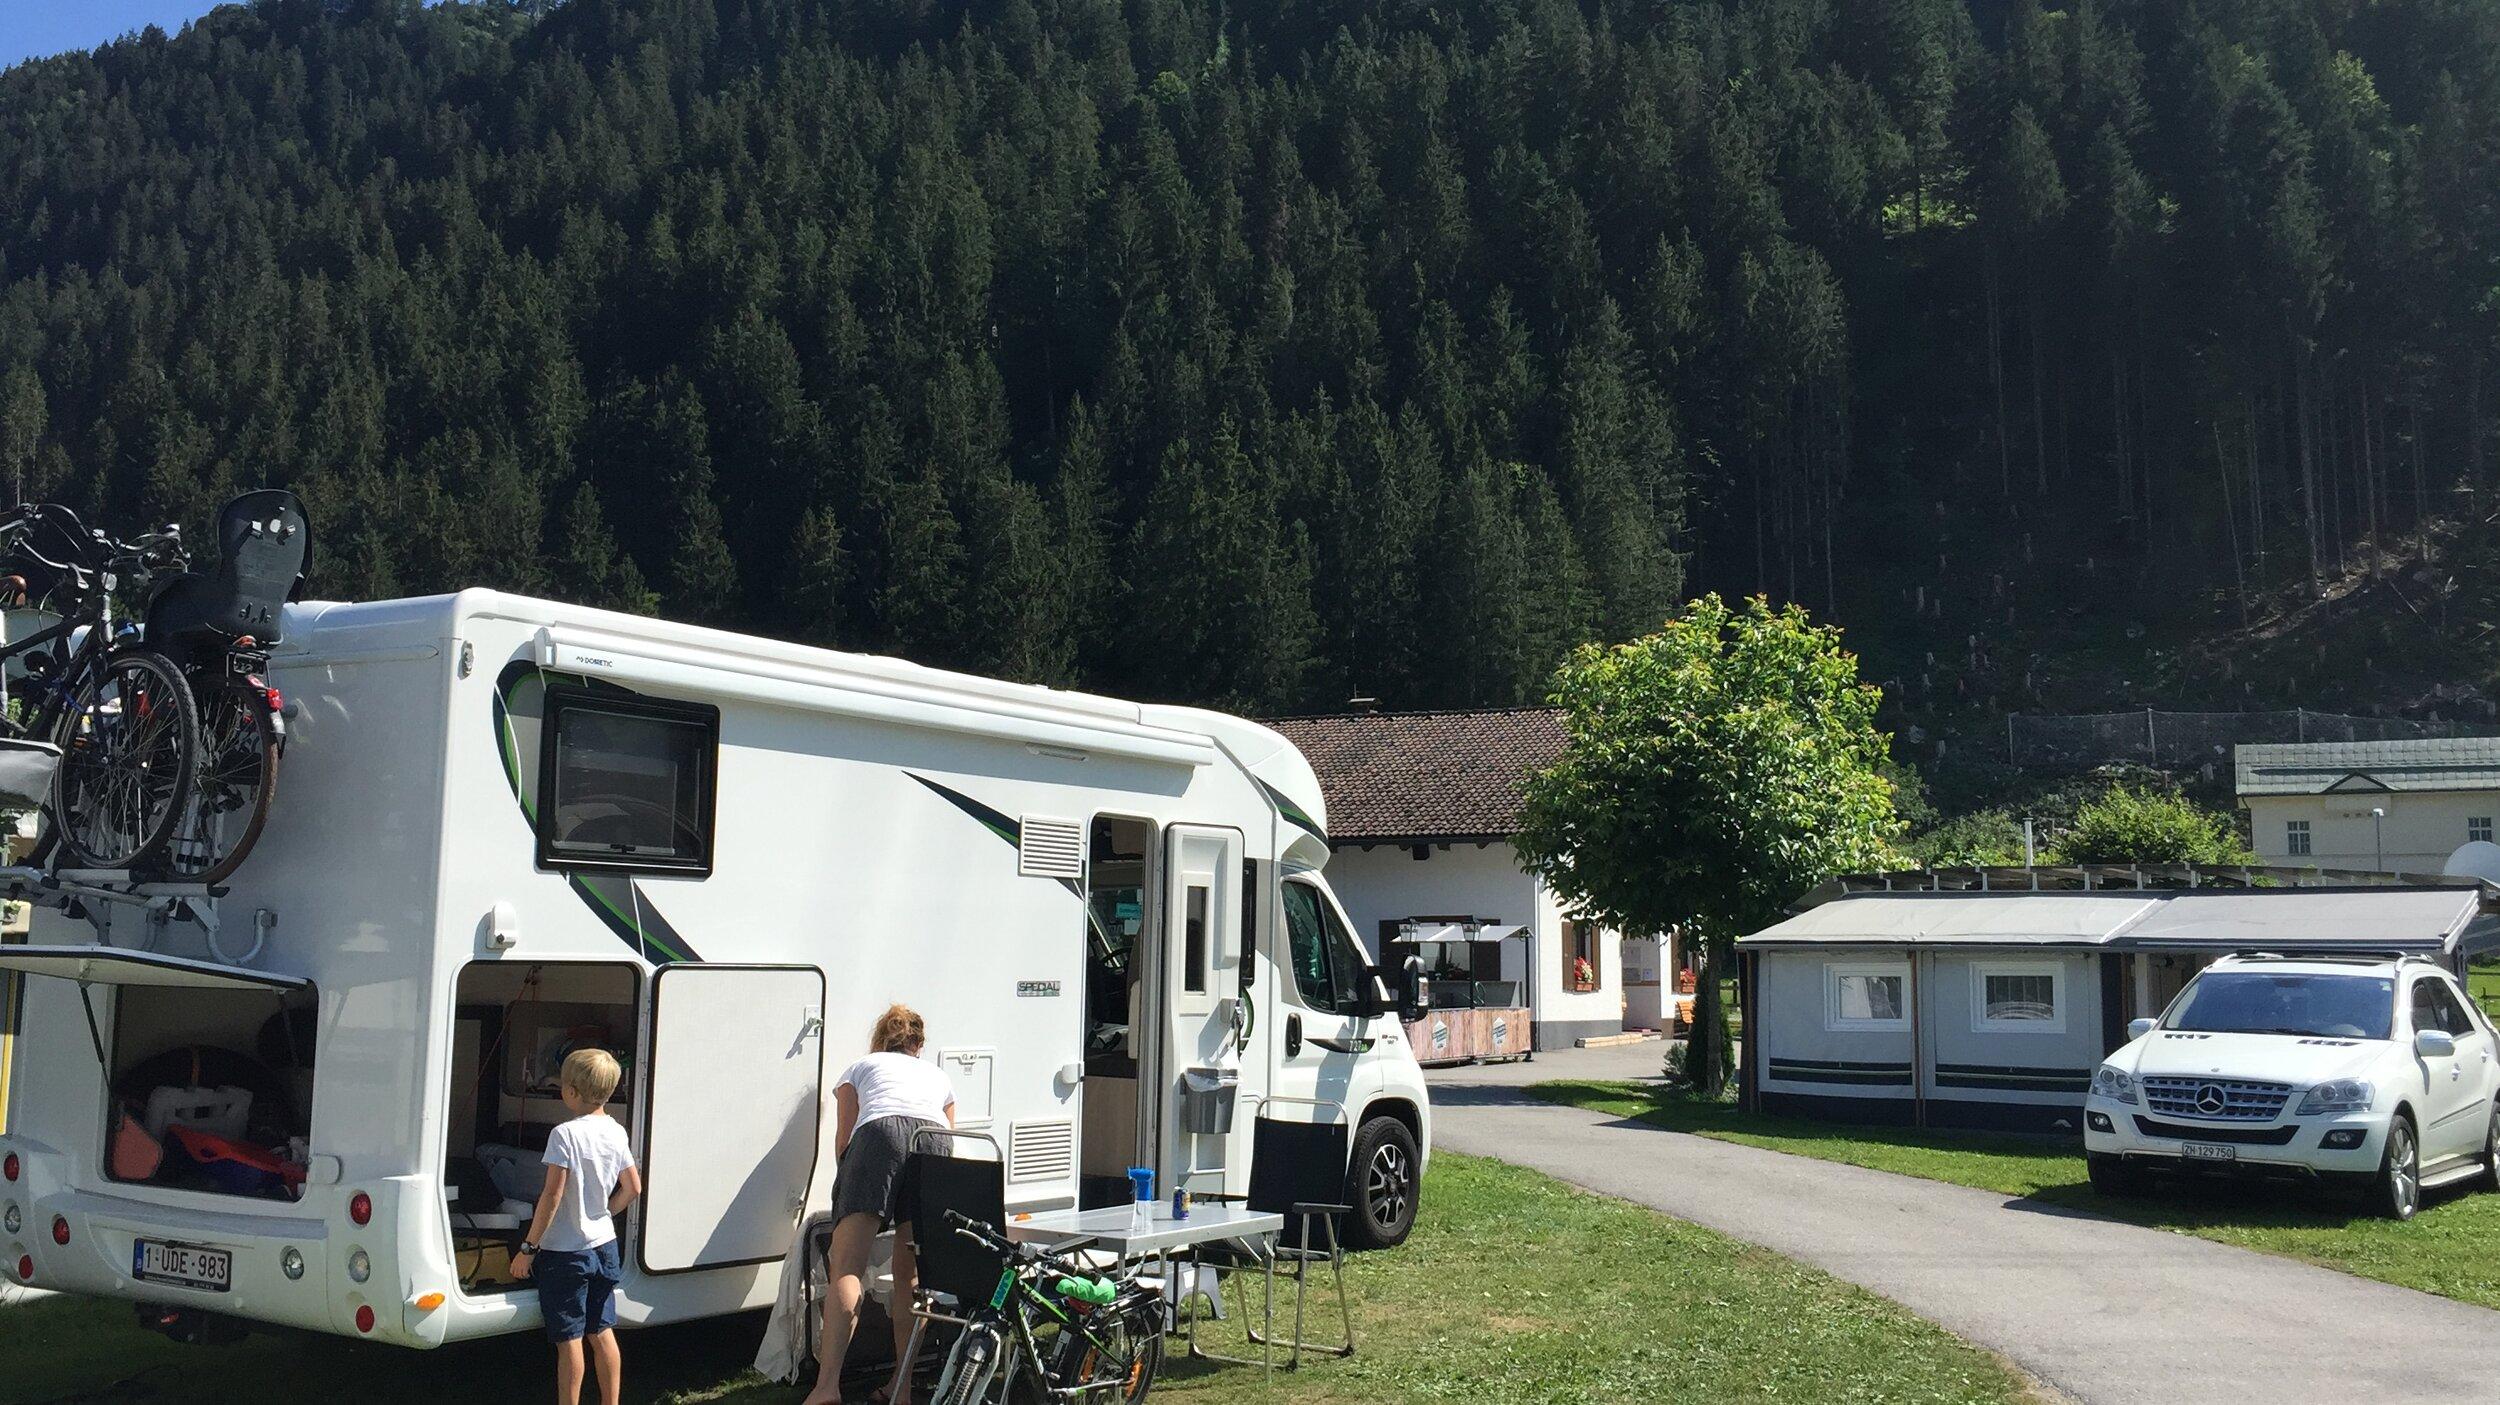 Op de camping in Tschagguns/Schruns waar er gelukkig nog één plekje was.